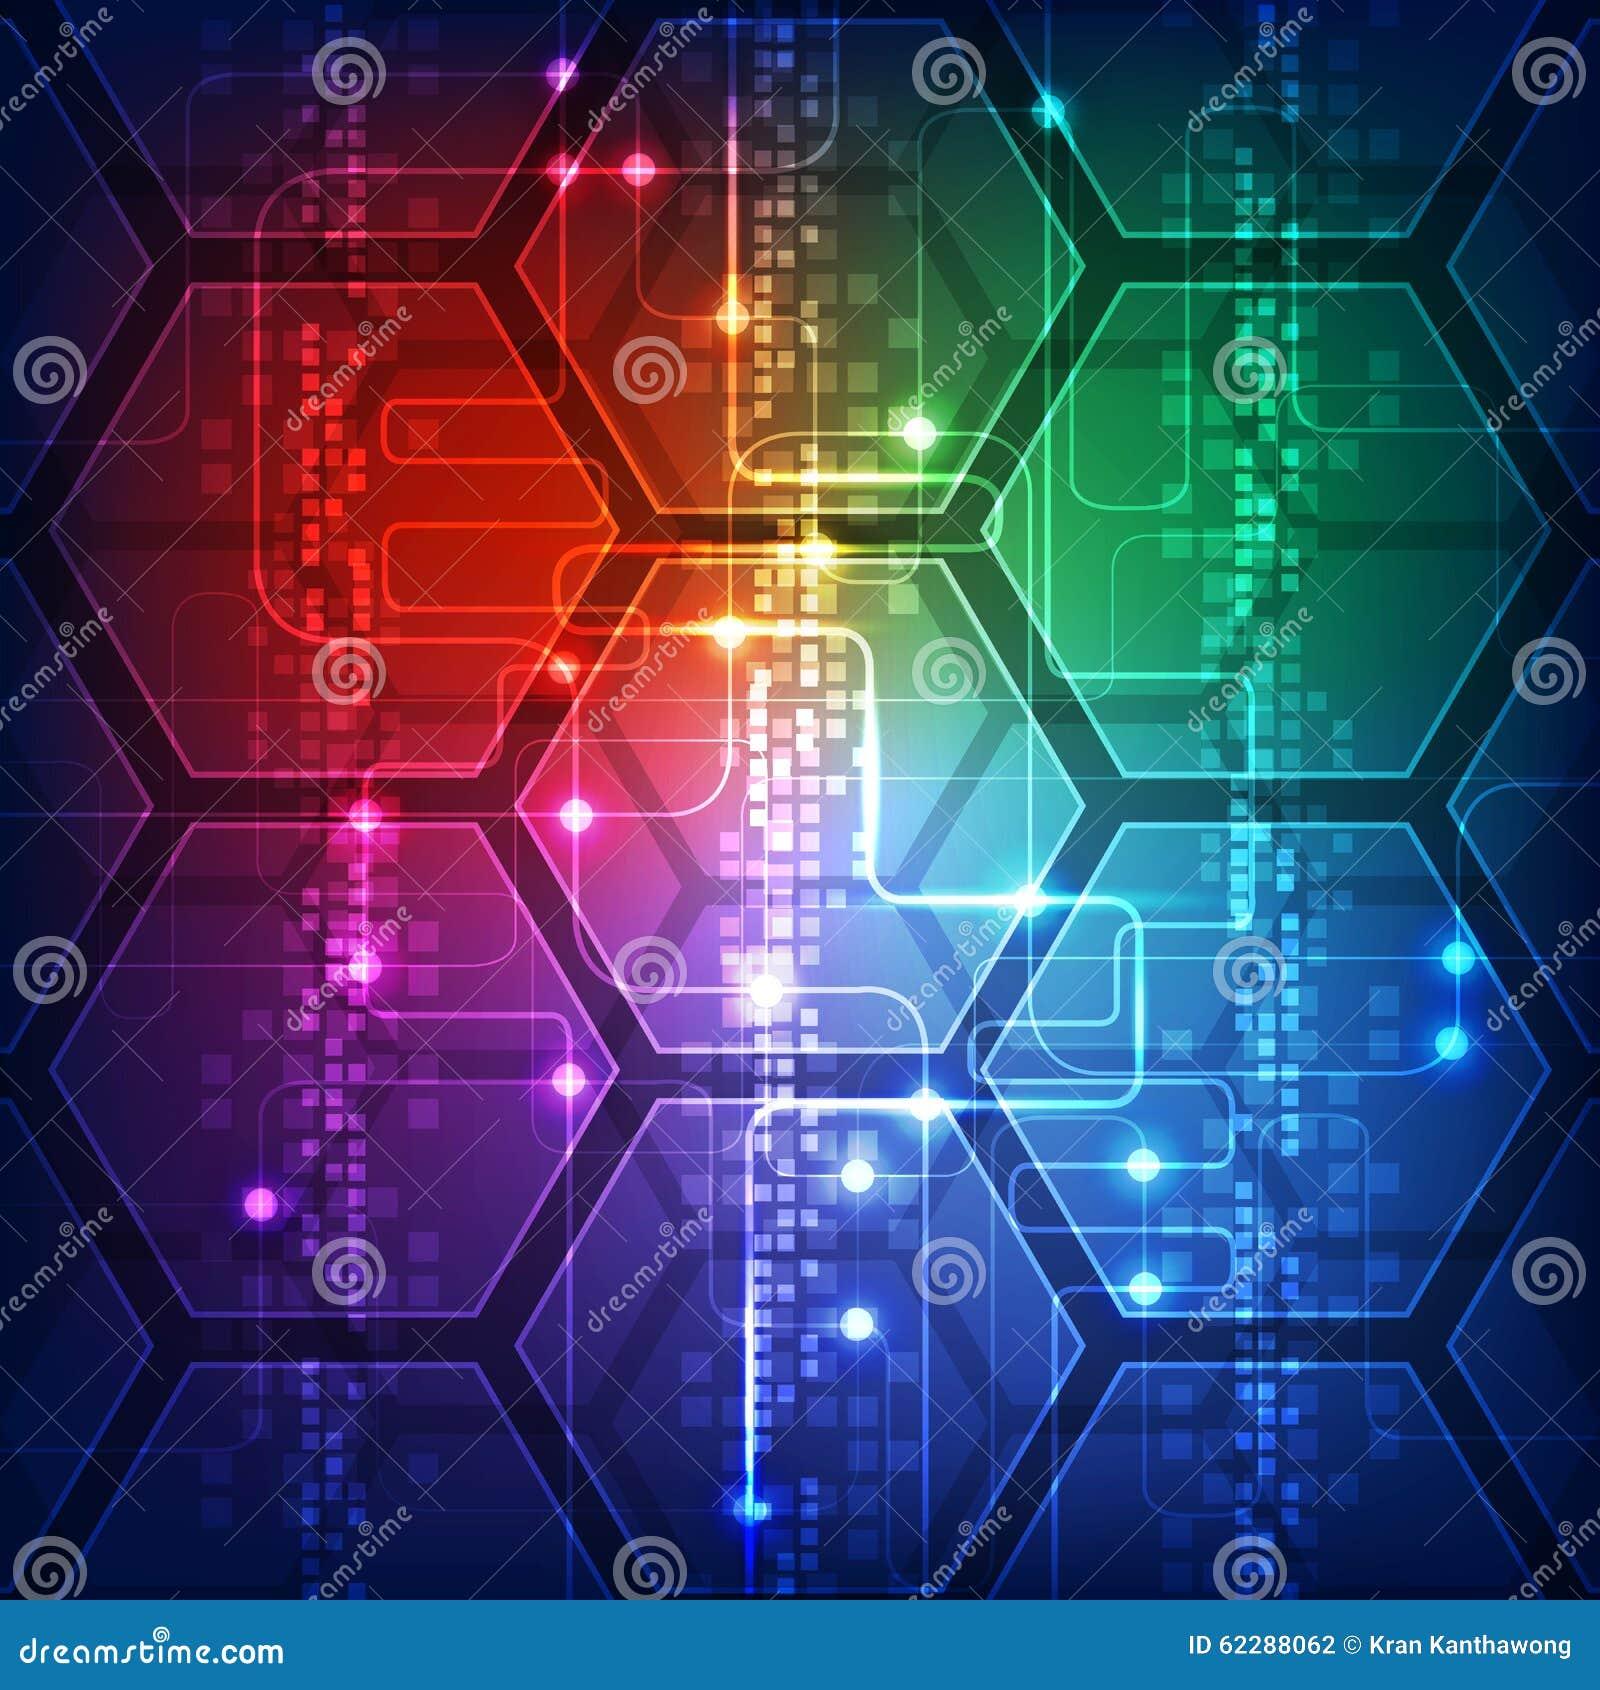 Vector Illustration Hi-tech Digital Technology Concept  Abstract Background Stock Vector